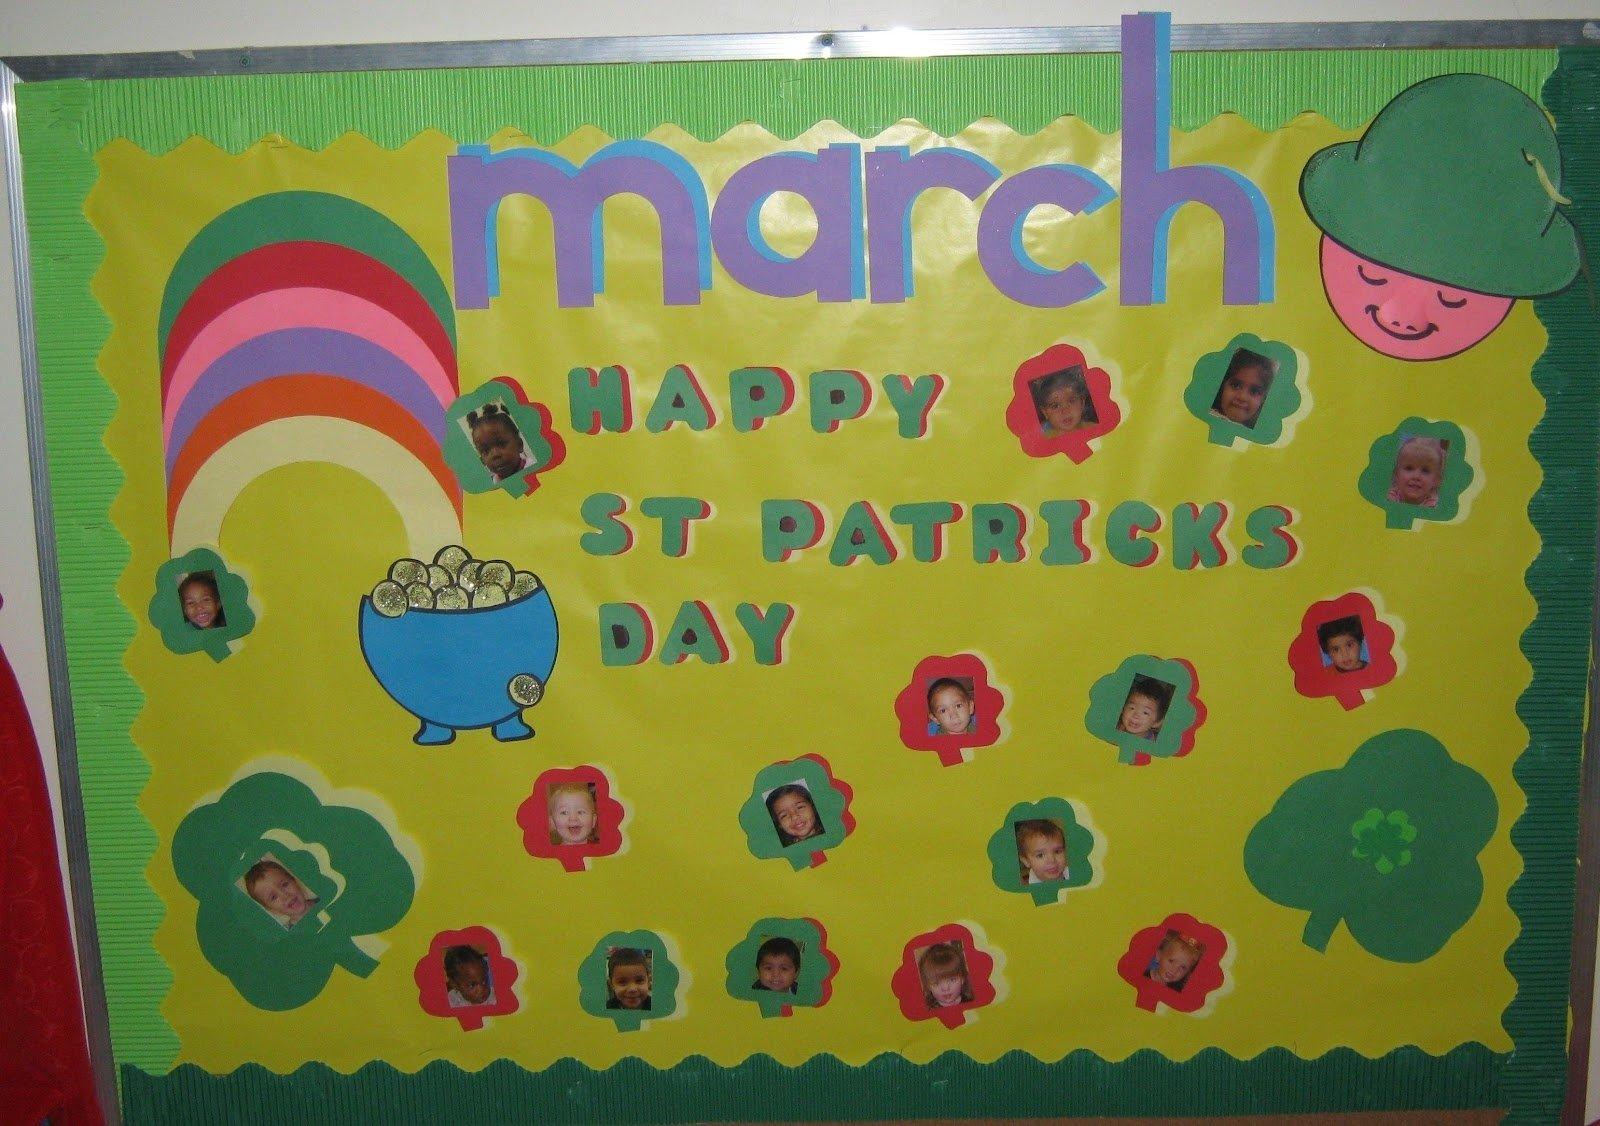 10 Stylish Preschool March Bulletin Board Ideas kreative resources bulletin boards 2 2020